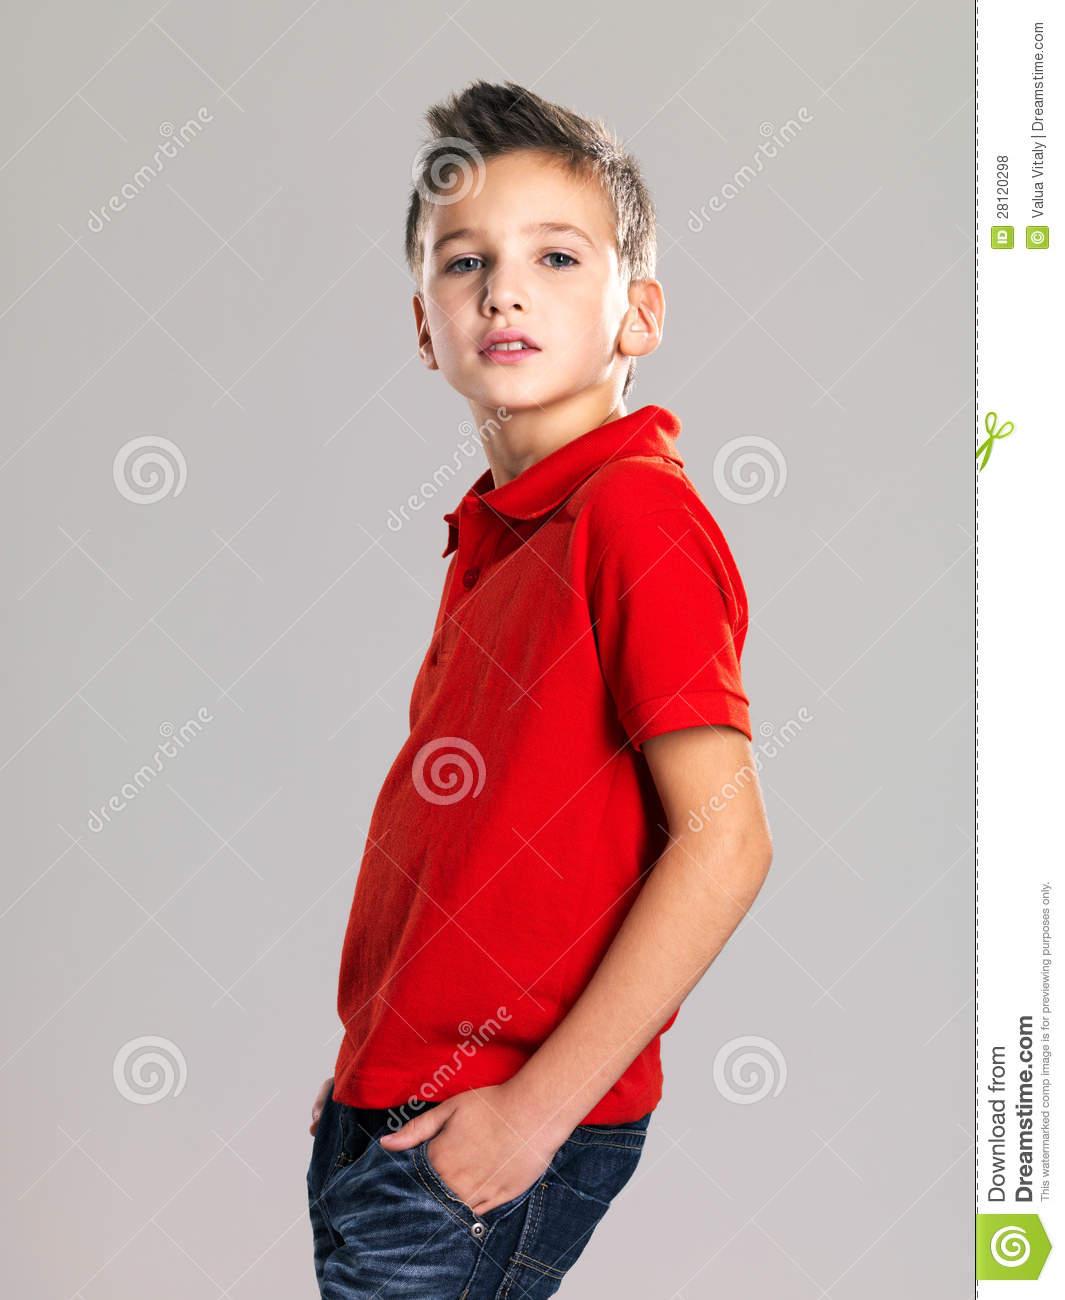 Pretty Boy Posing At Studio As A Fashion Model. Royalty Free Stock.